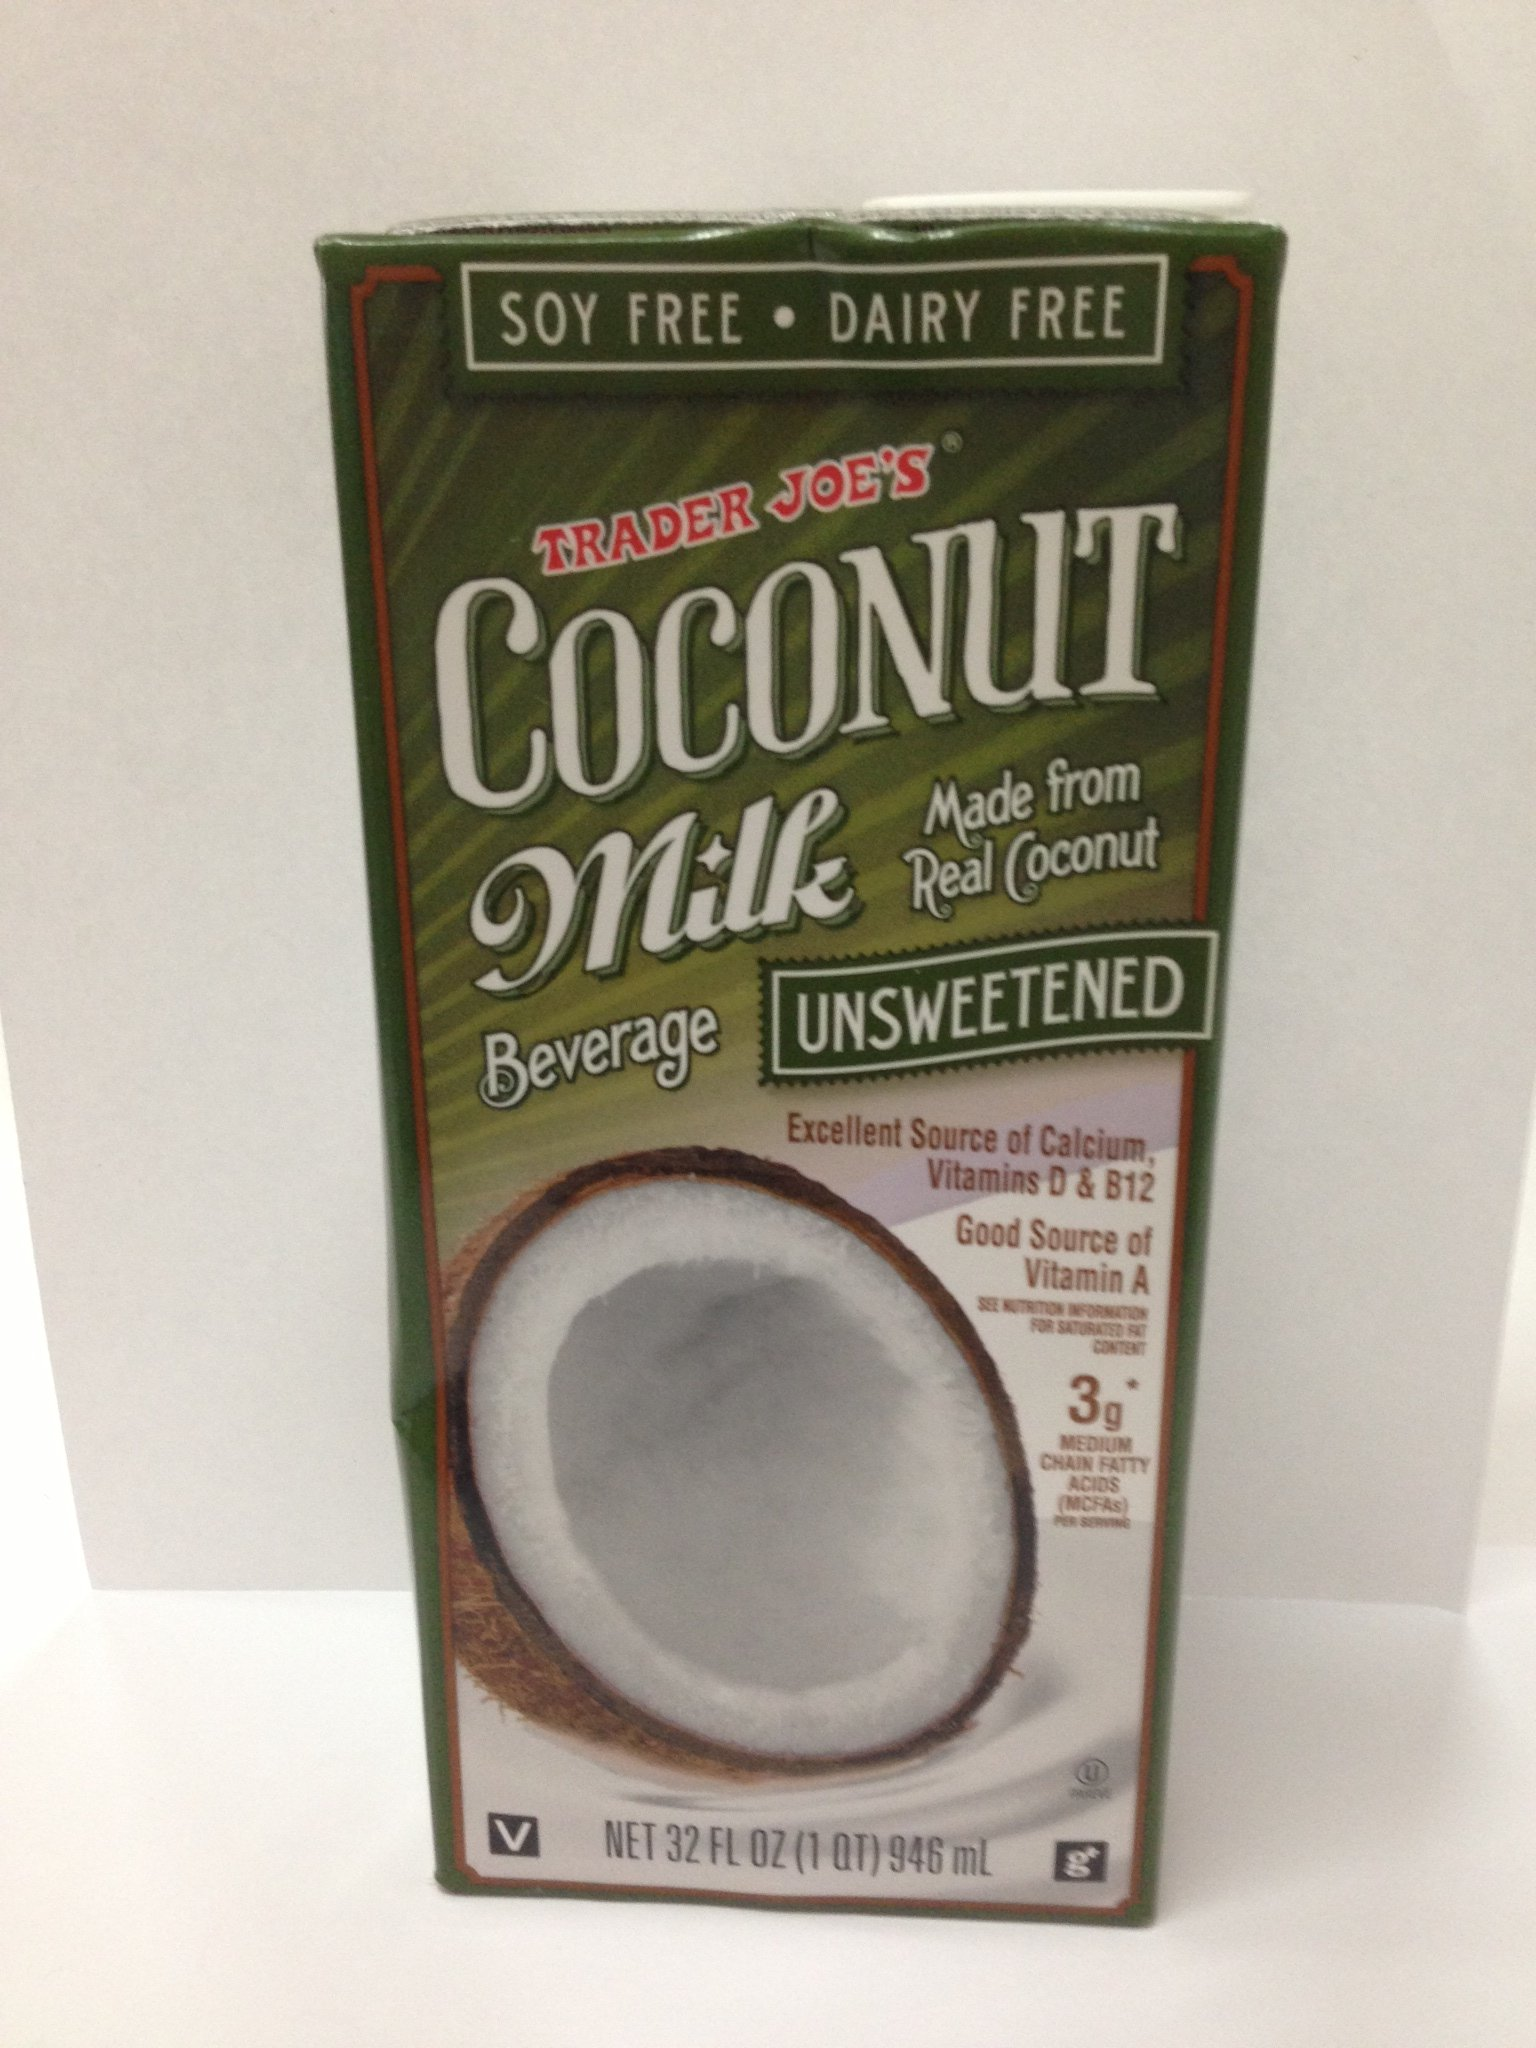 Trader Joe's Coconut Milk Beverage Unsweetened (Pack of 3)